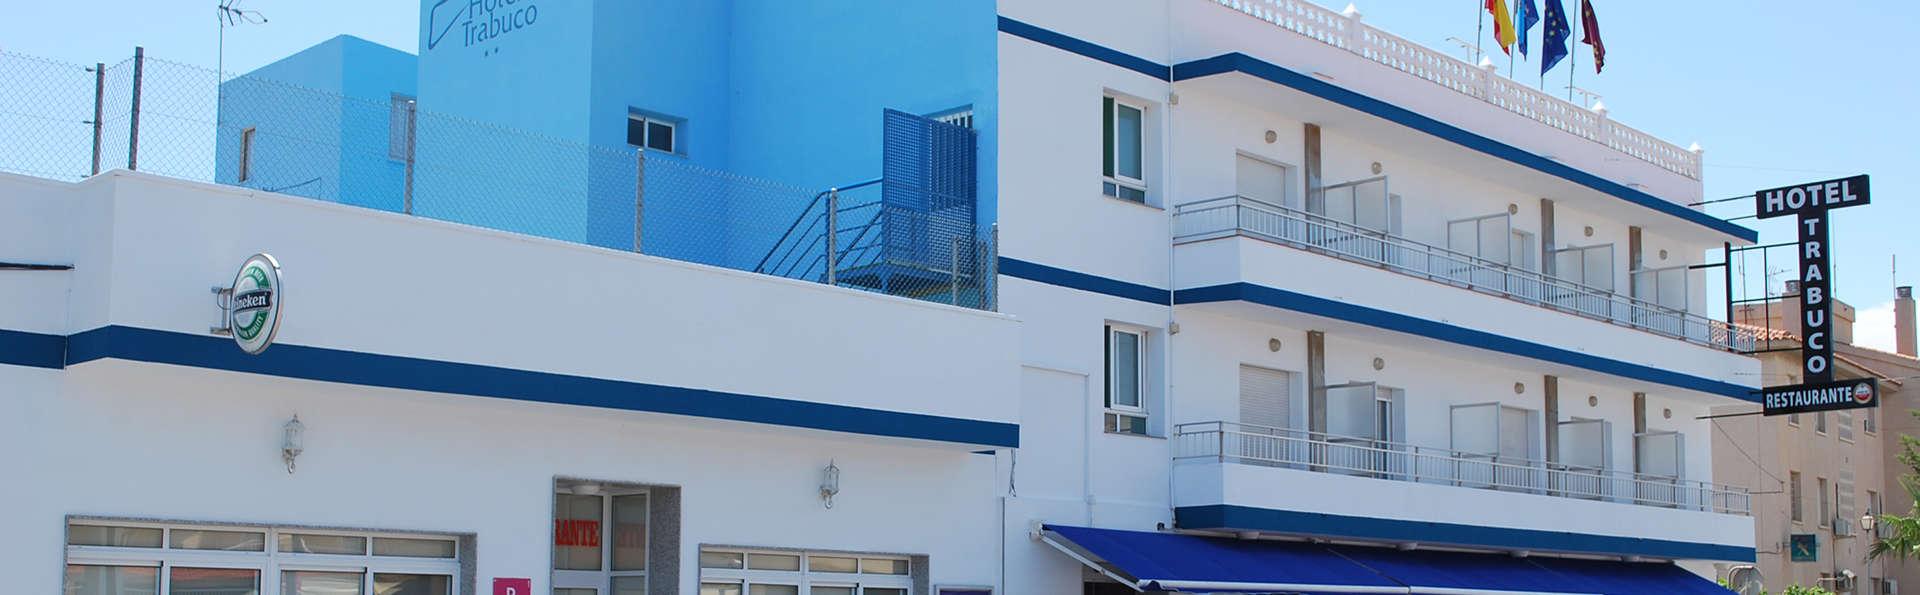 Hotel Trabuco  - edit_front2.jpg